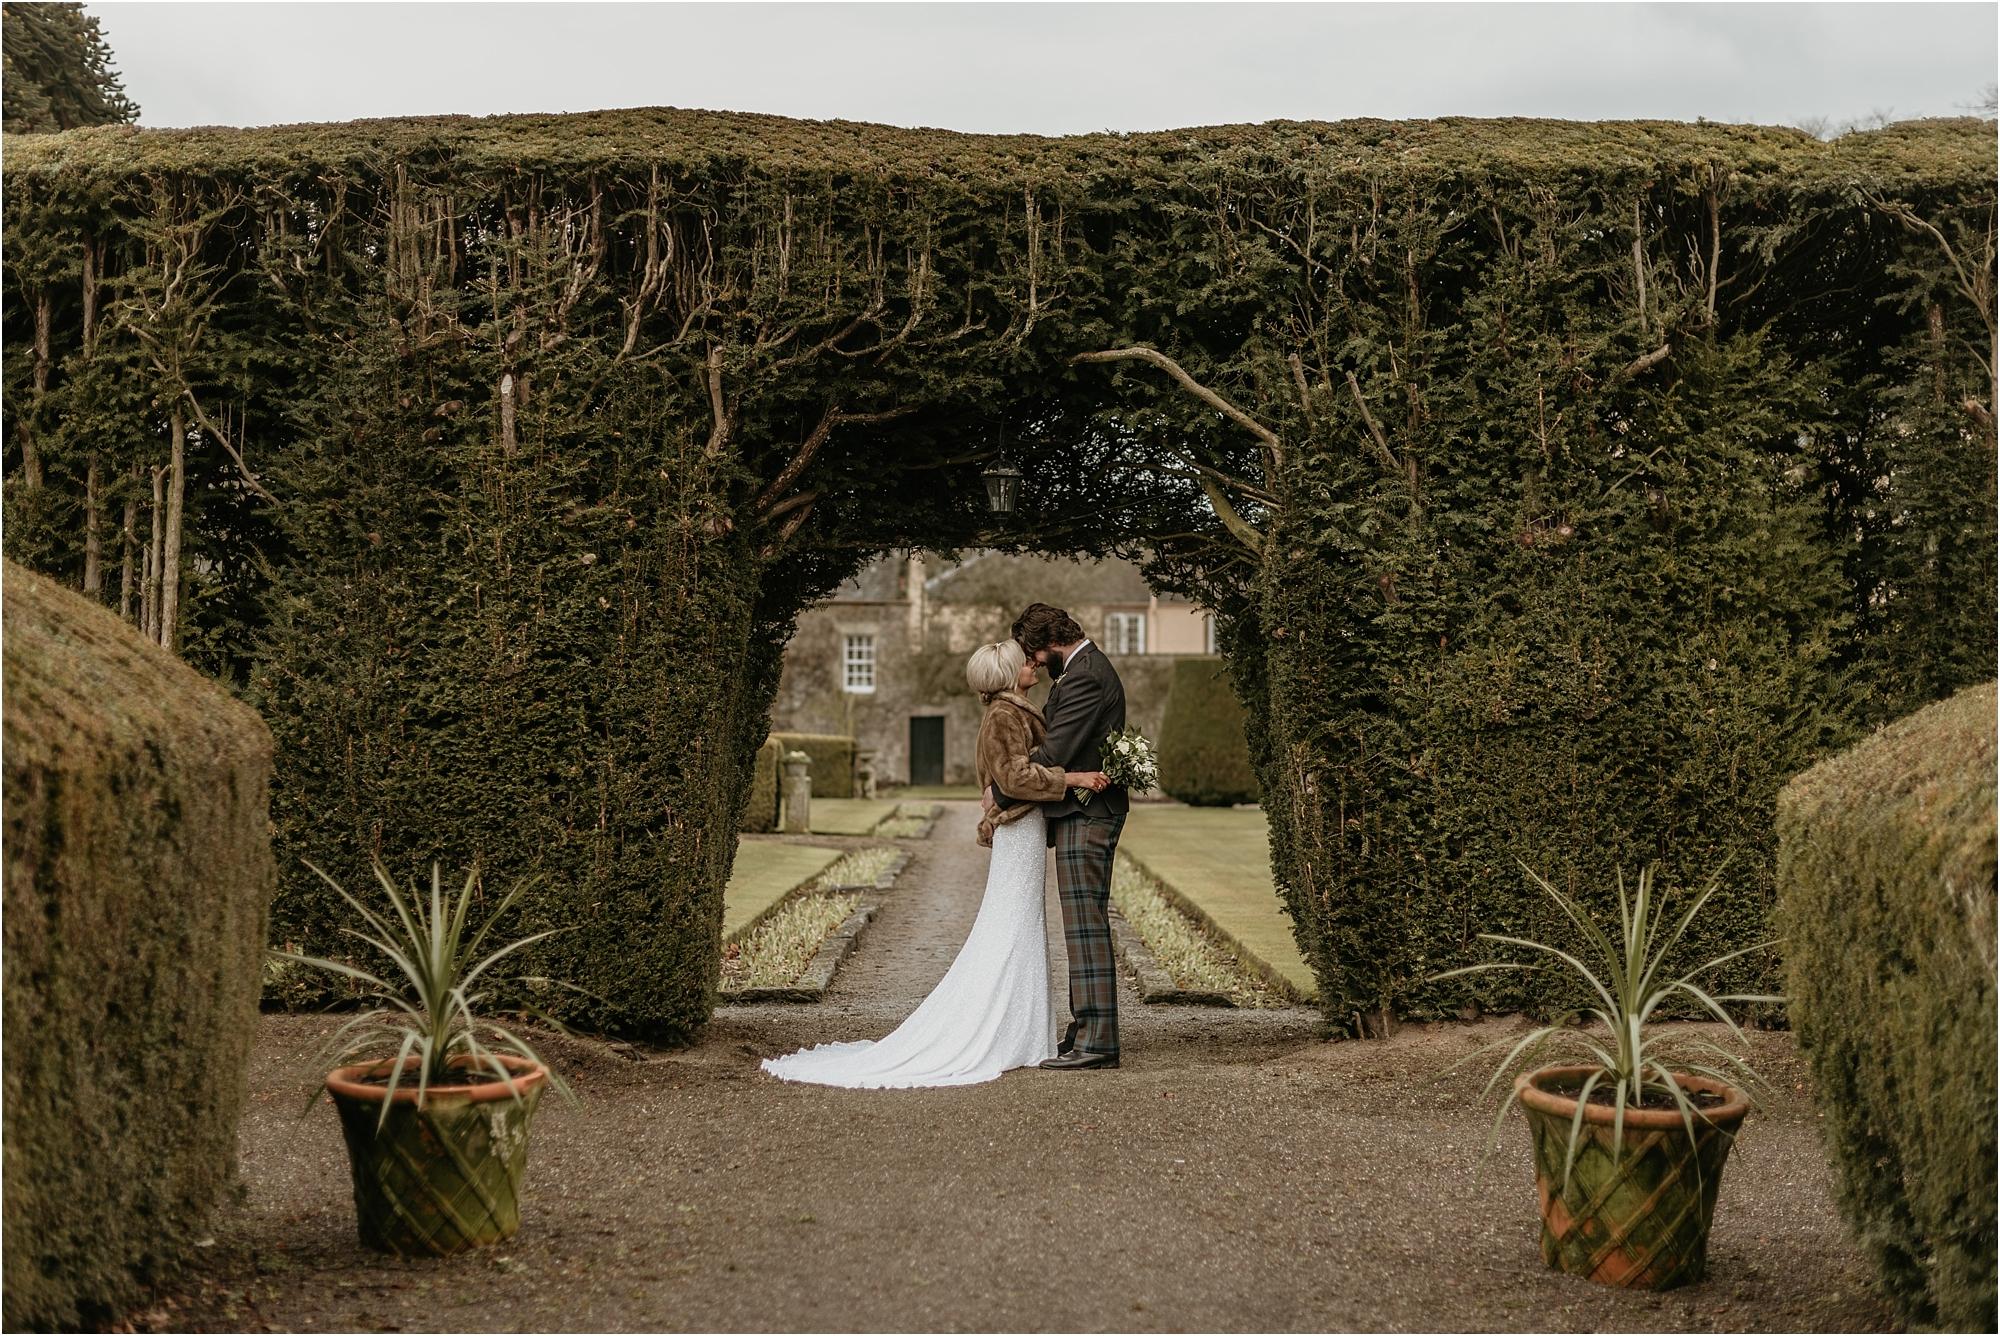 Myres-Castle-Wedding-Photographer_52.jpg